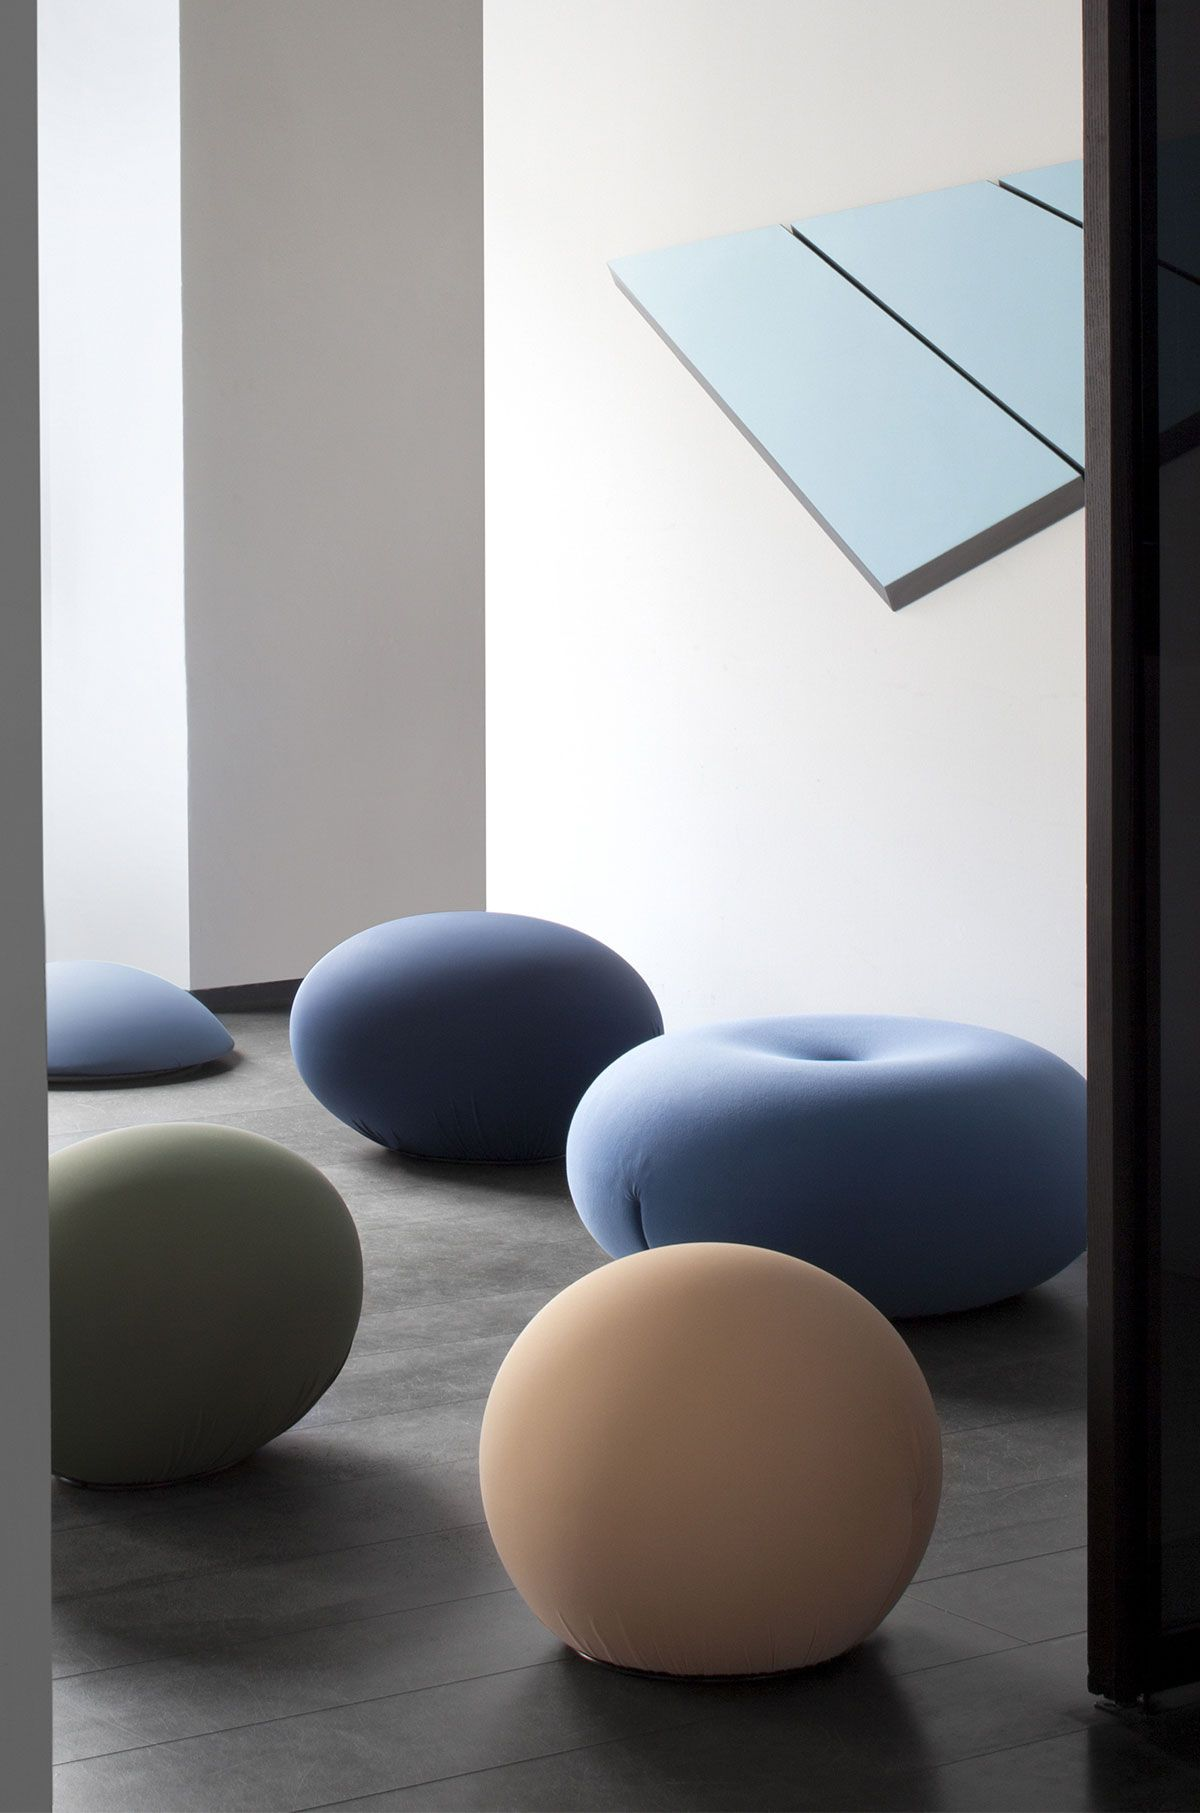 Tato collection designed by denis santachiara for baleri italia available at linea inc modern furniture los angeles infolinea inc com modernhome